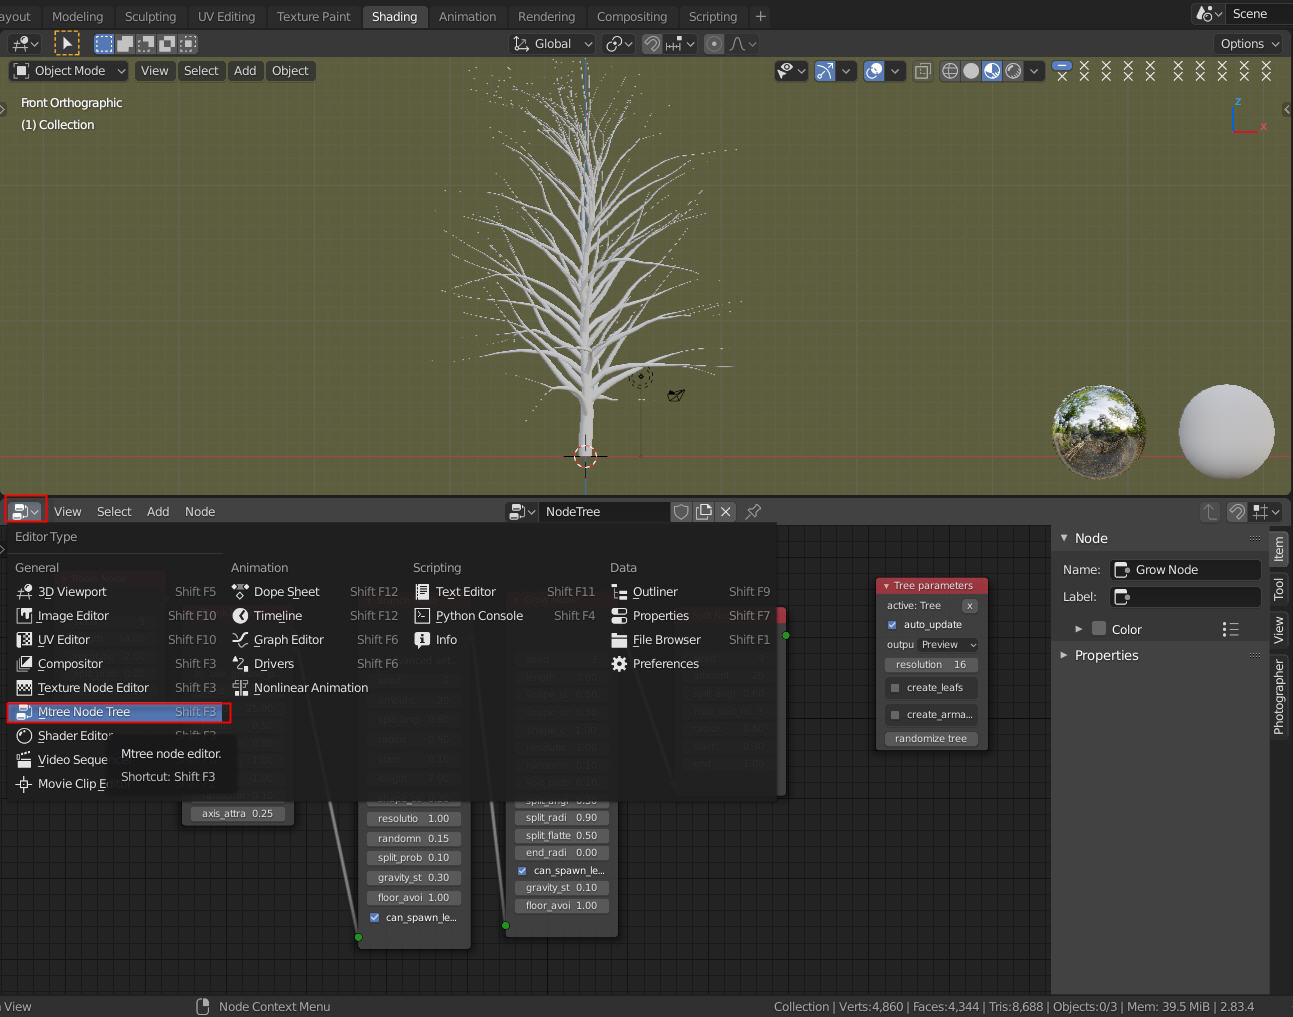 mtree_nodes